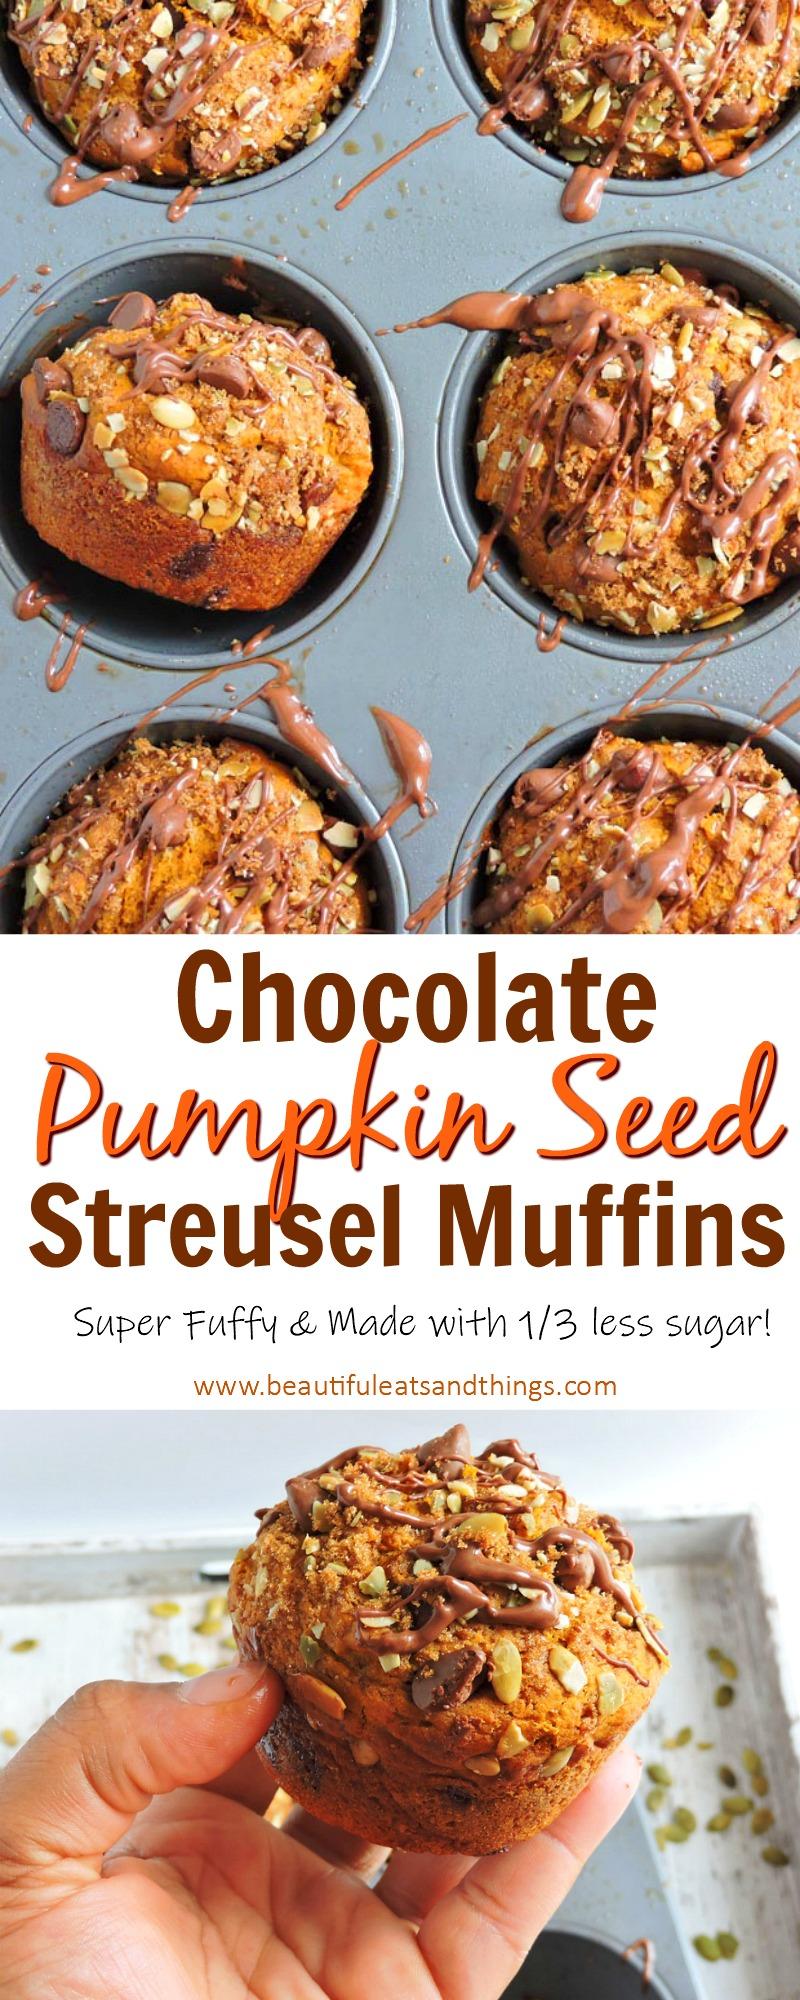 Chocolate Pumpkin Streusel Muffins